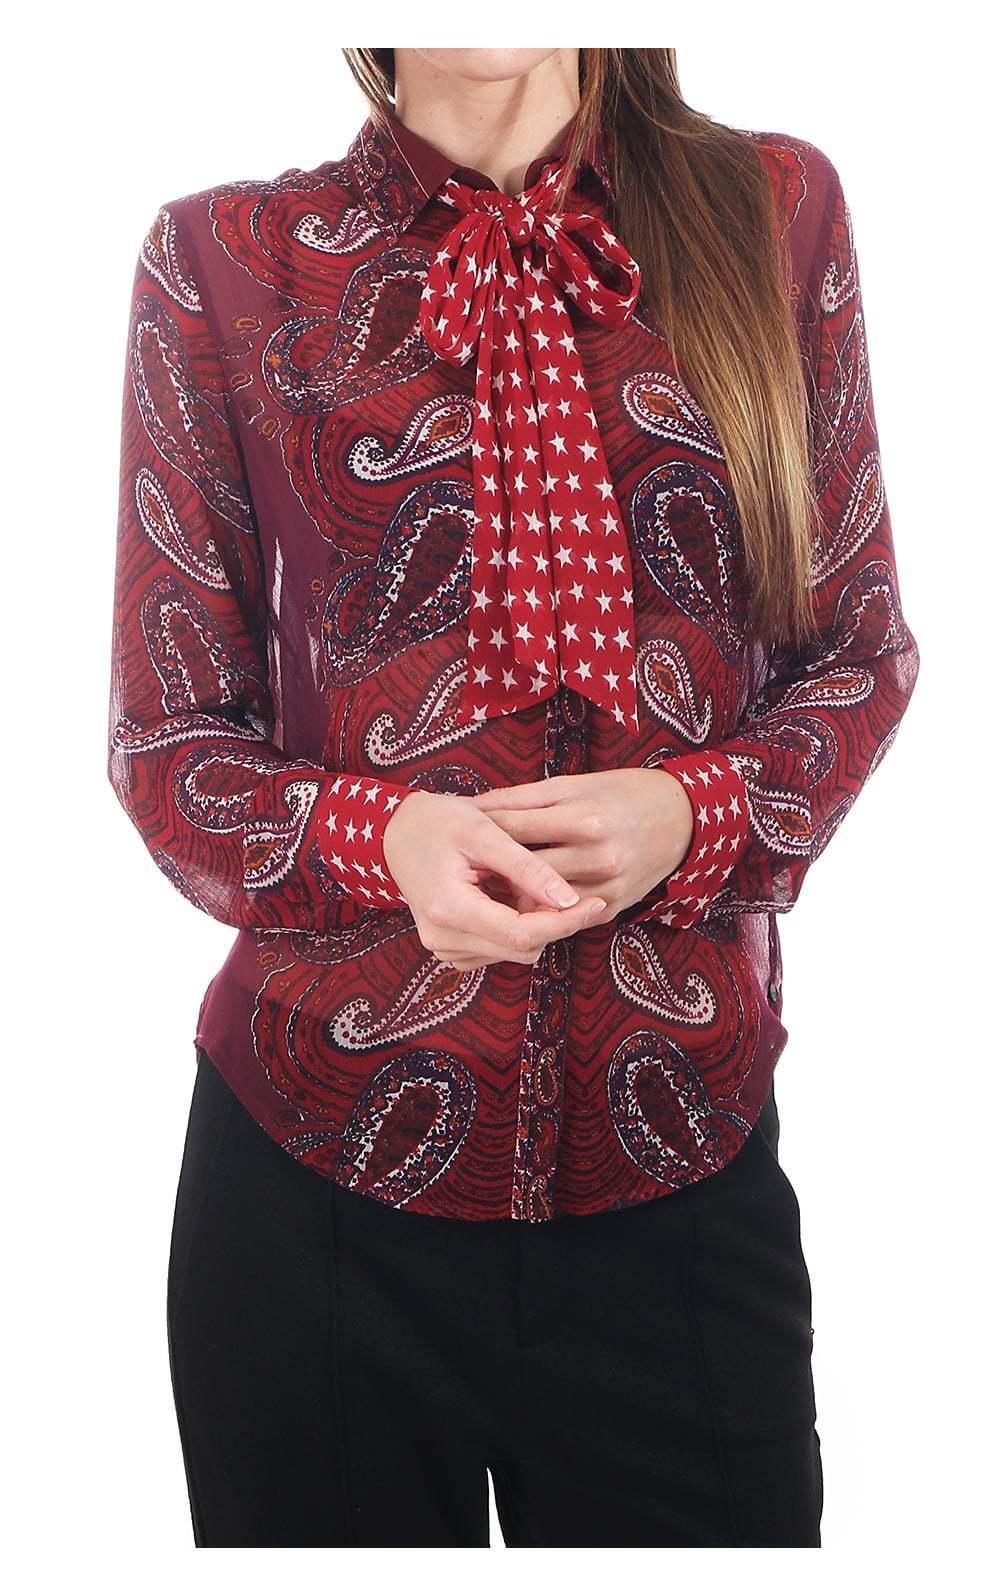 Maison SCOTCH top Paisley Con Star Cravatta Viola